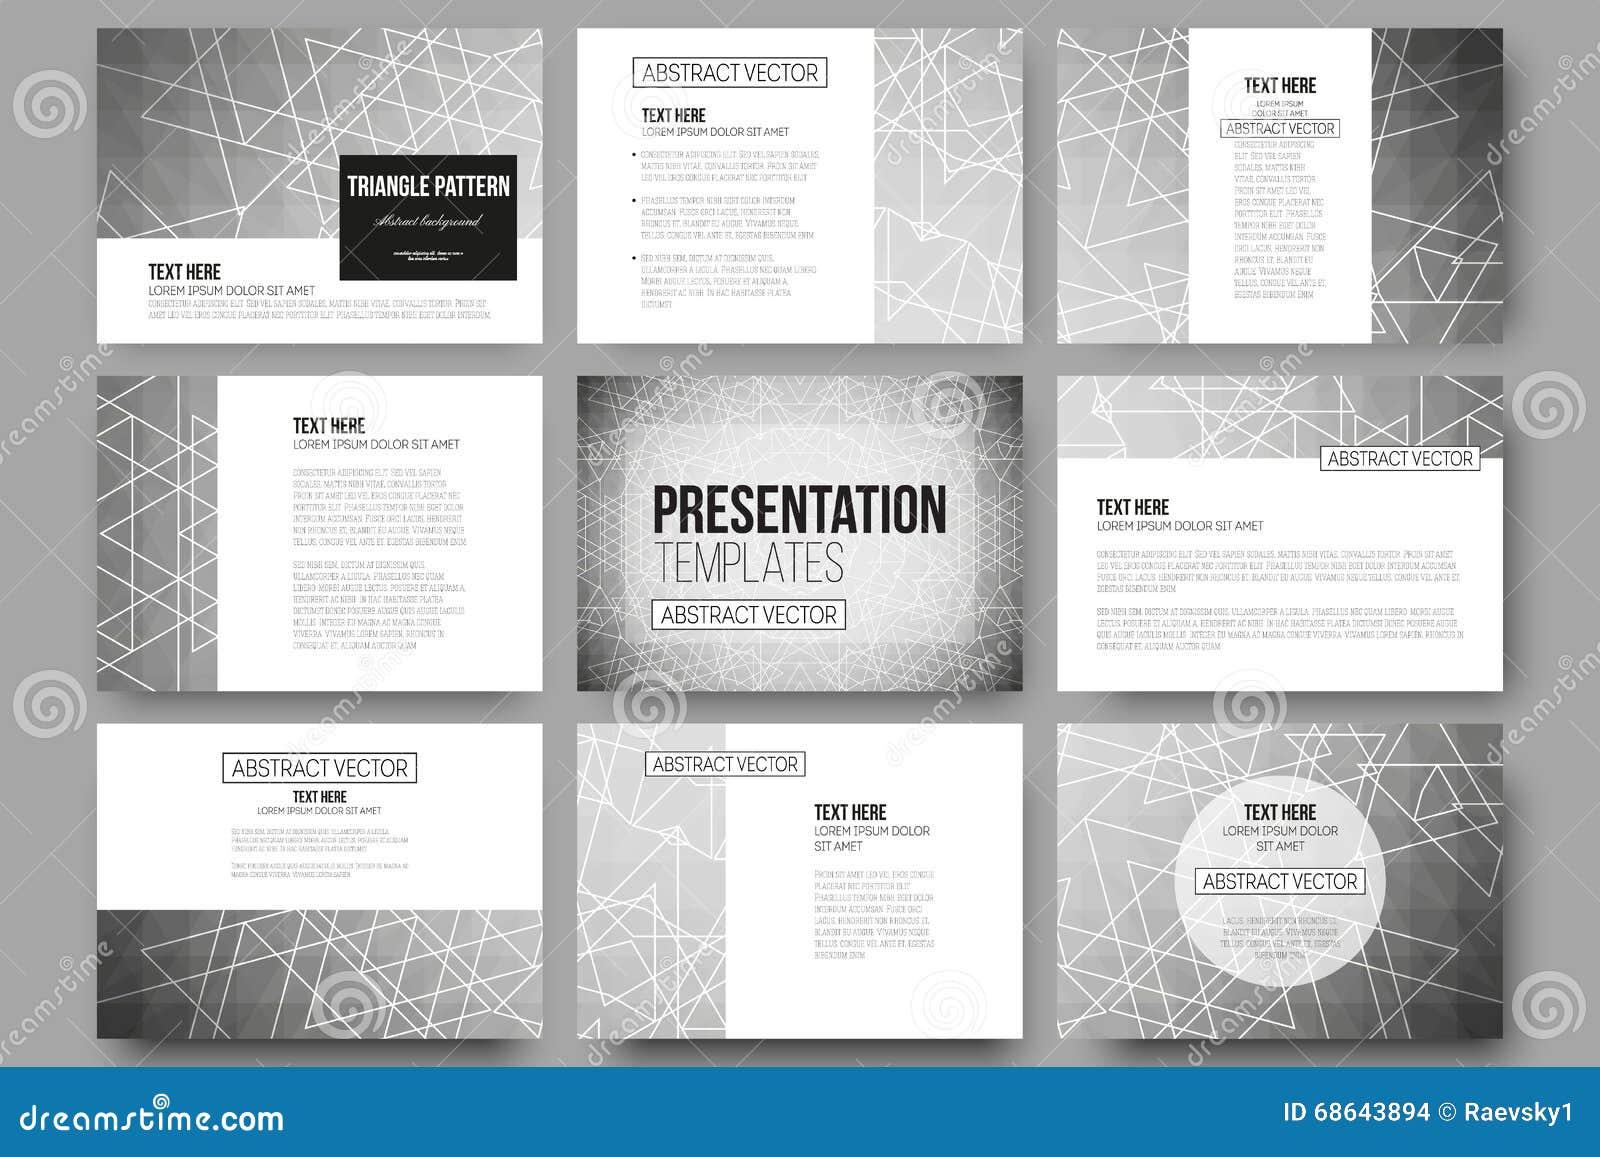 Set Of 9 Vector Templates For Presentation Slides Sacred Geometry Triangle Design Gray Background